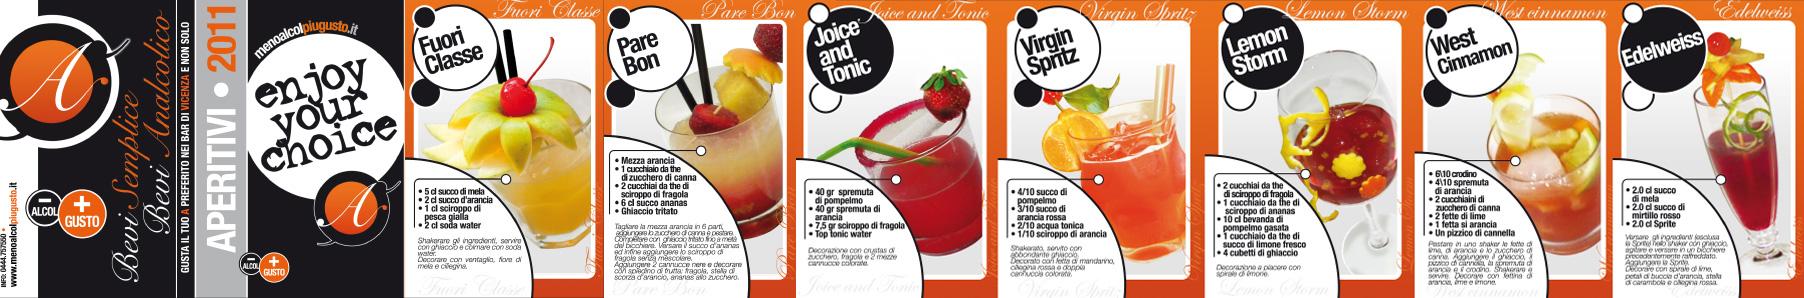 Drinks_2011